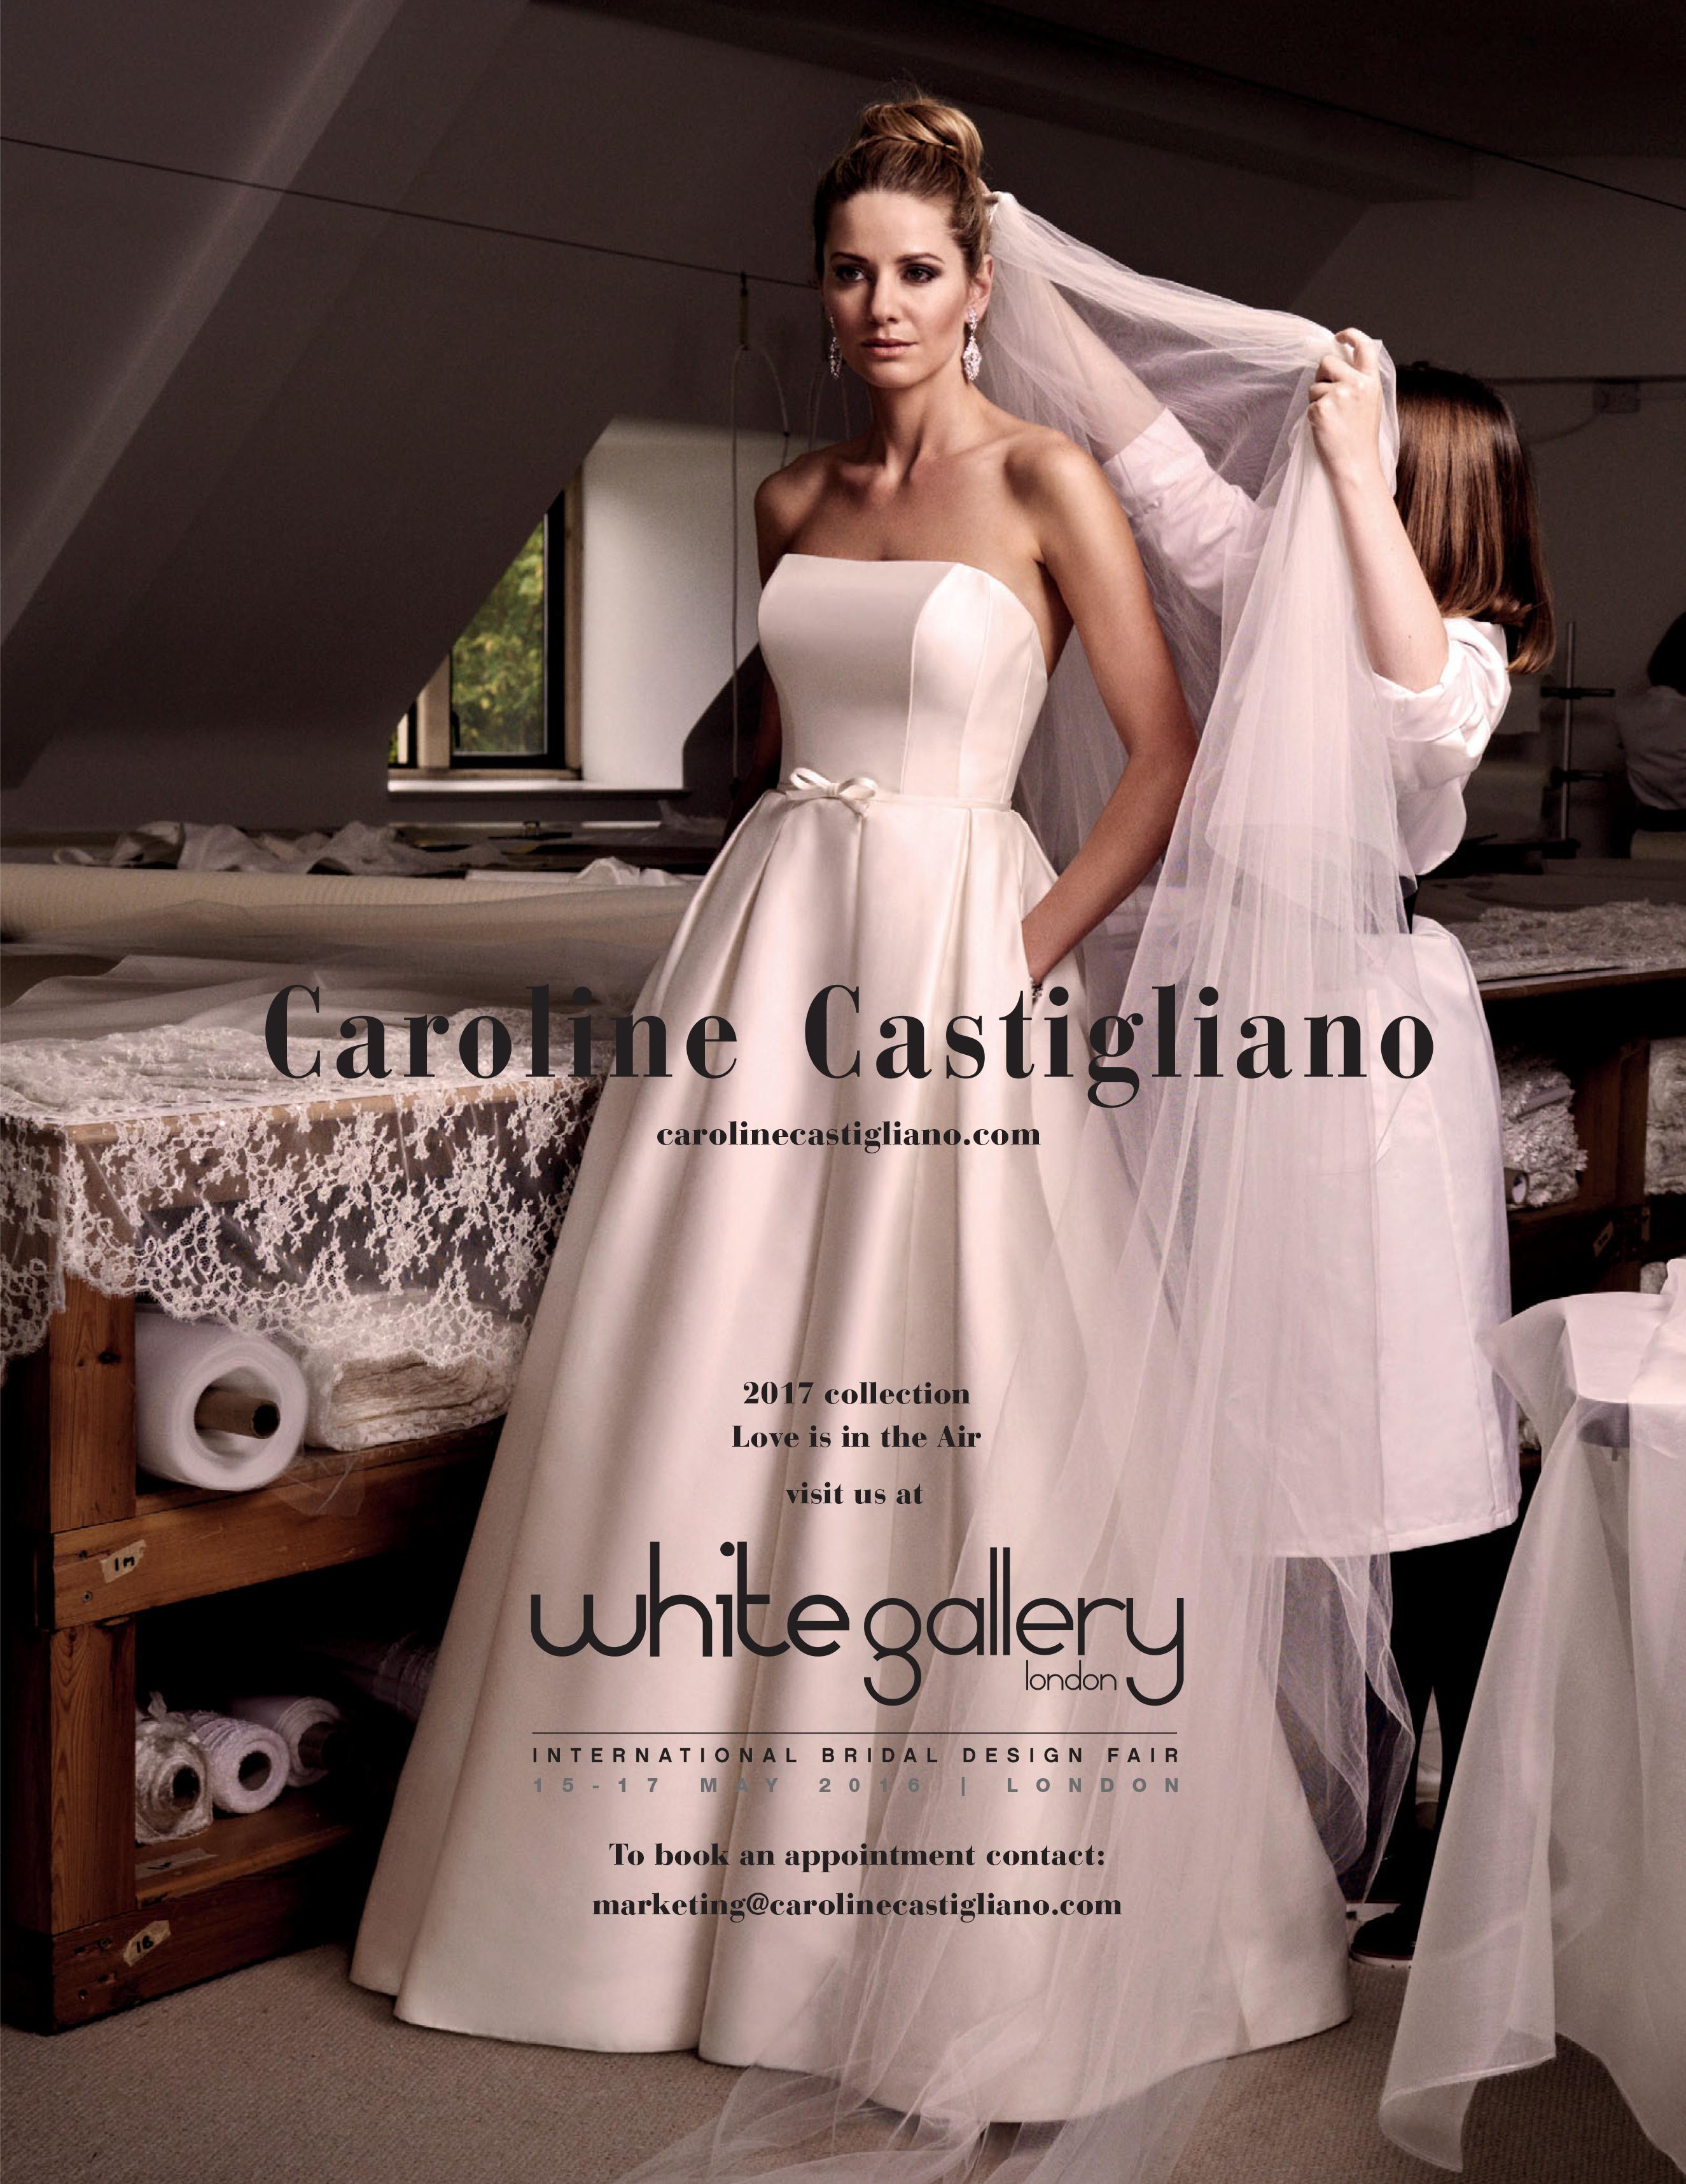 BRIDAL BUYER 2 designer wedding dresses by Caroline Castigliano